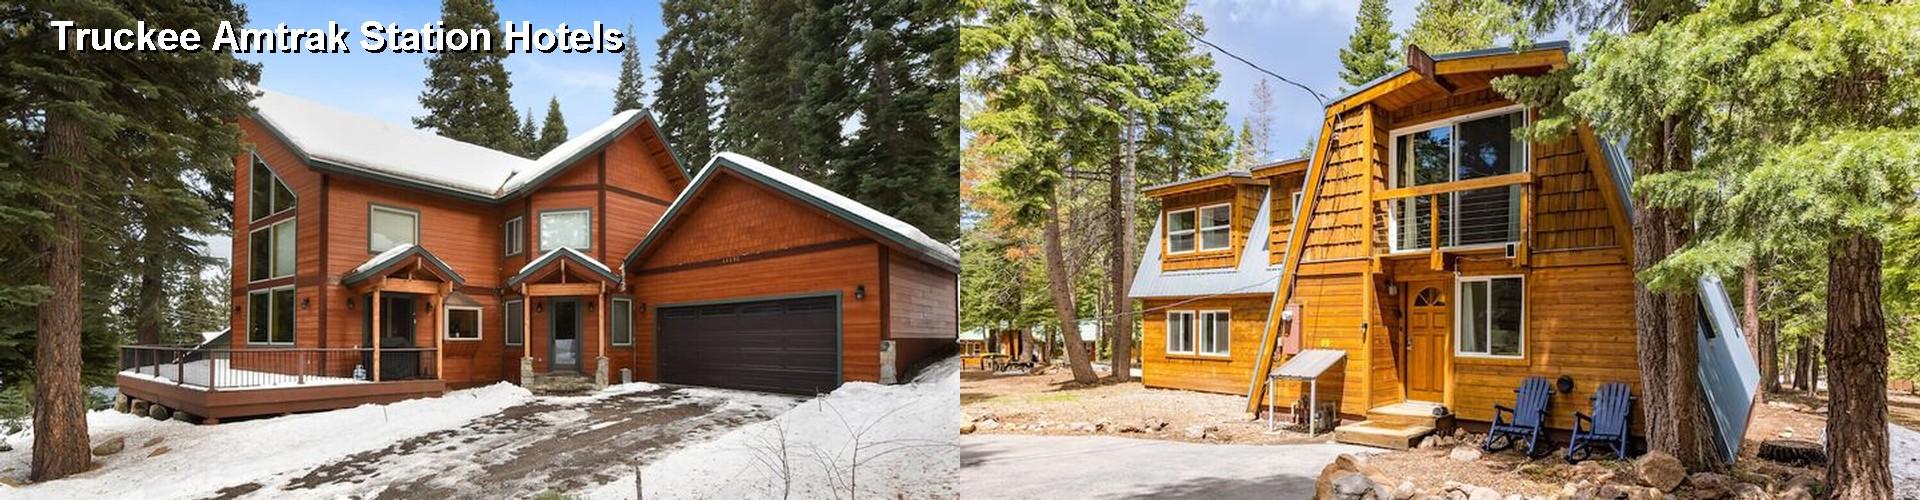 Best Kitchen Gallery: 51 Hotels Near Truckee Amtrak Station Ca of Hotels Near Northstar Ski Resort  on rachelxblog.com